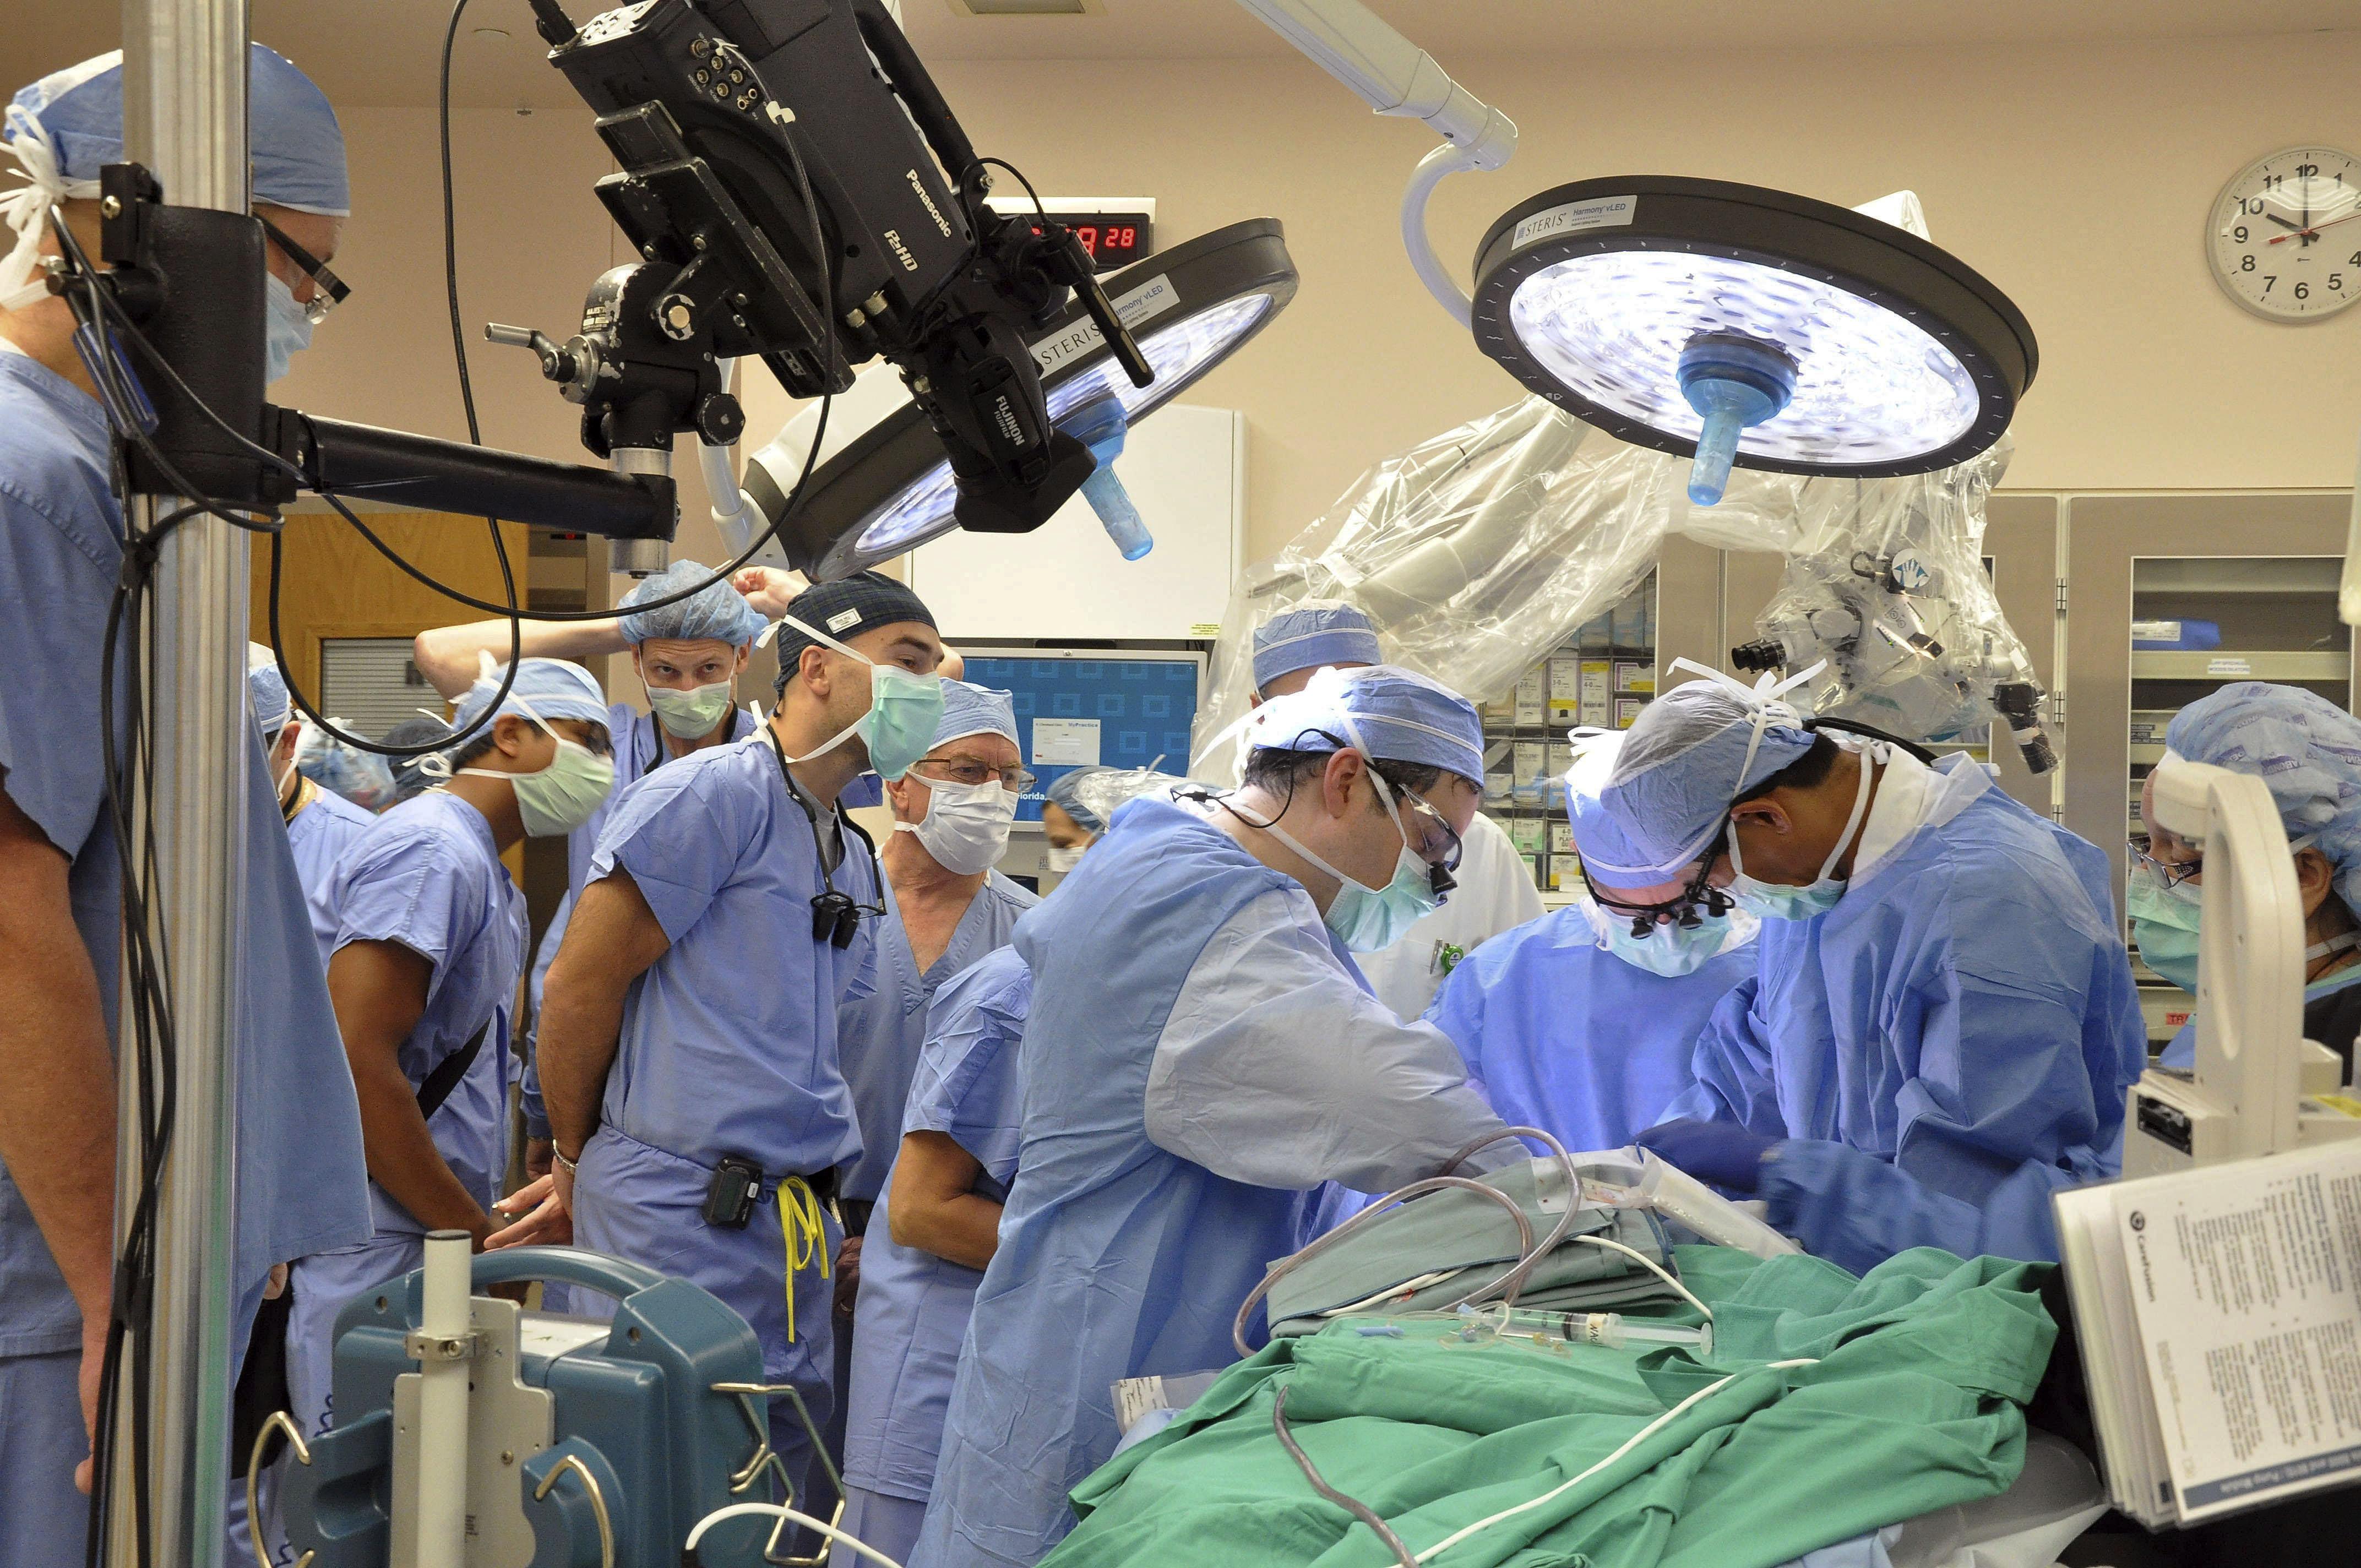 Man gets near-total face transplant - CBS News